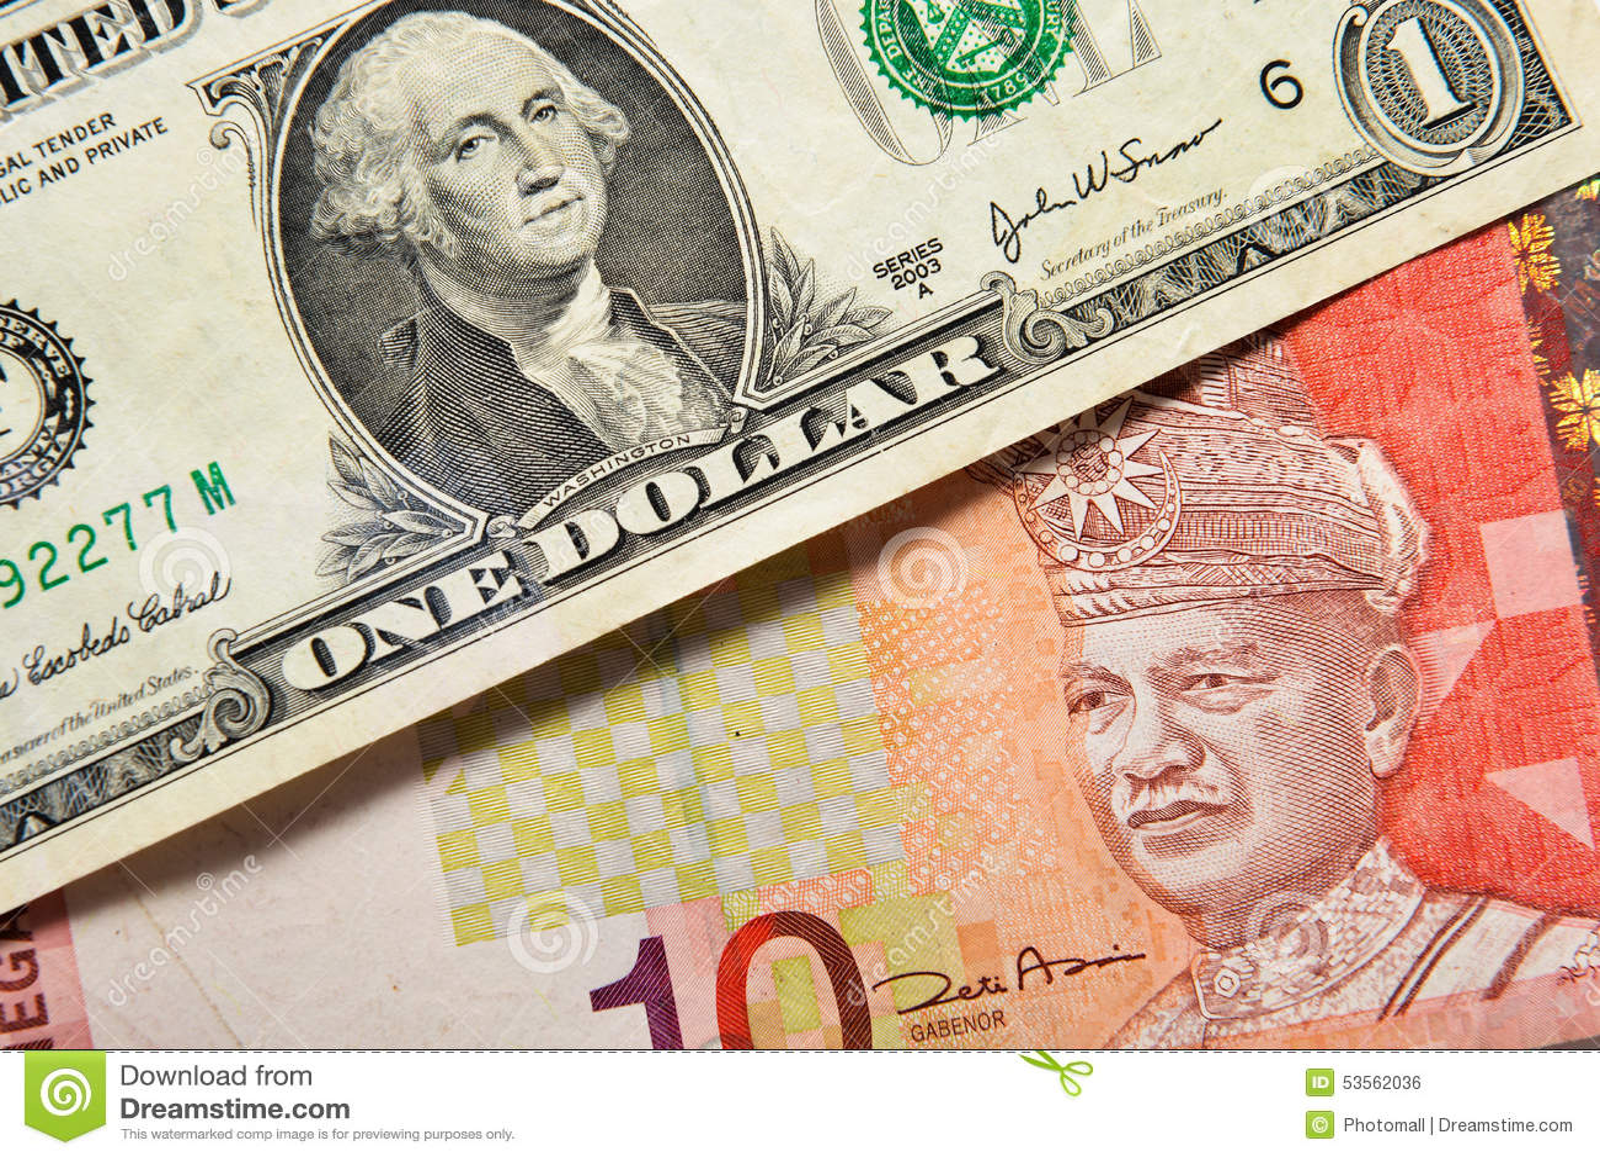 Us Dollar And Ringgit Malaysia Stock Photo Image Of Euro American 53562036